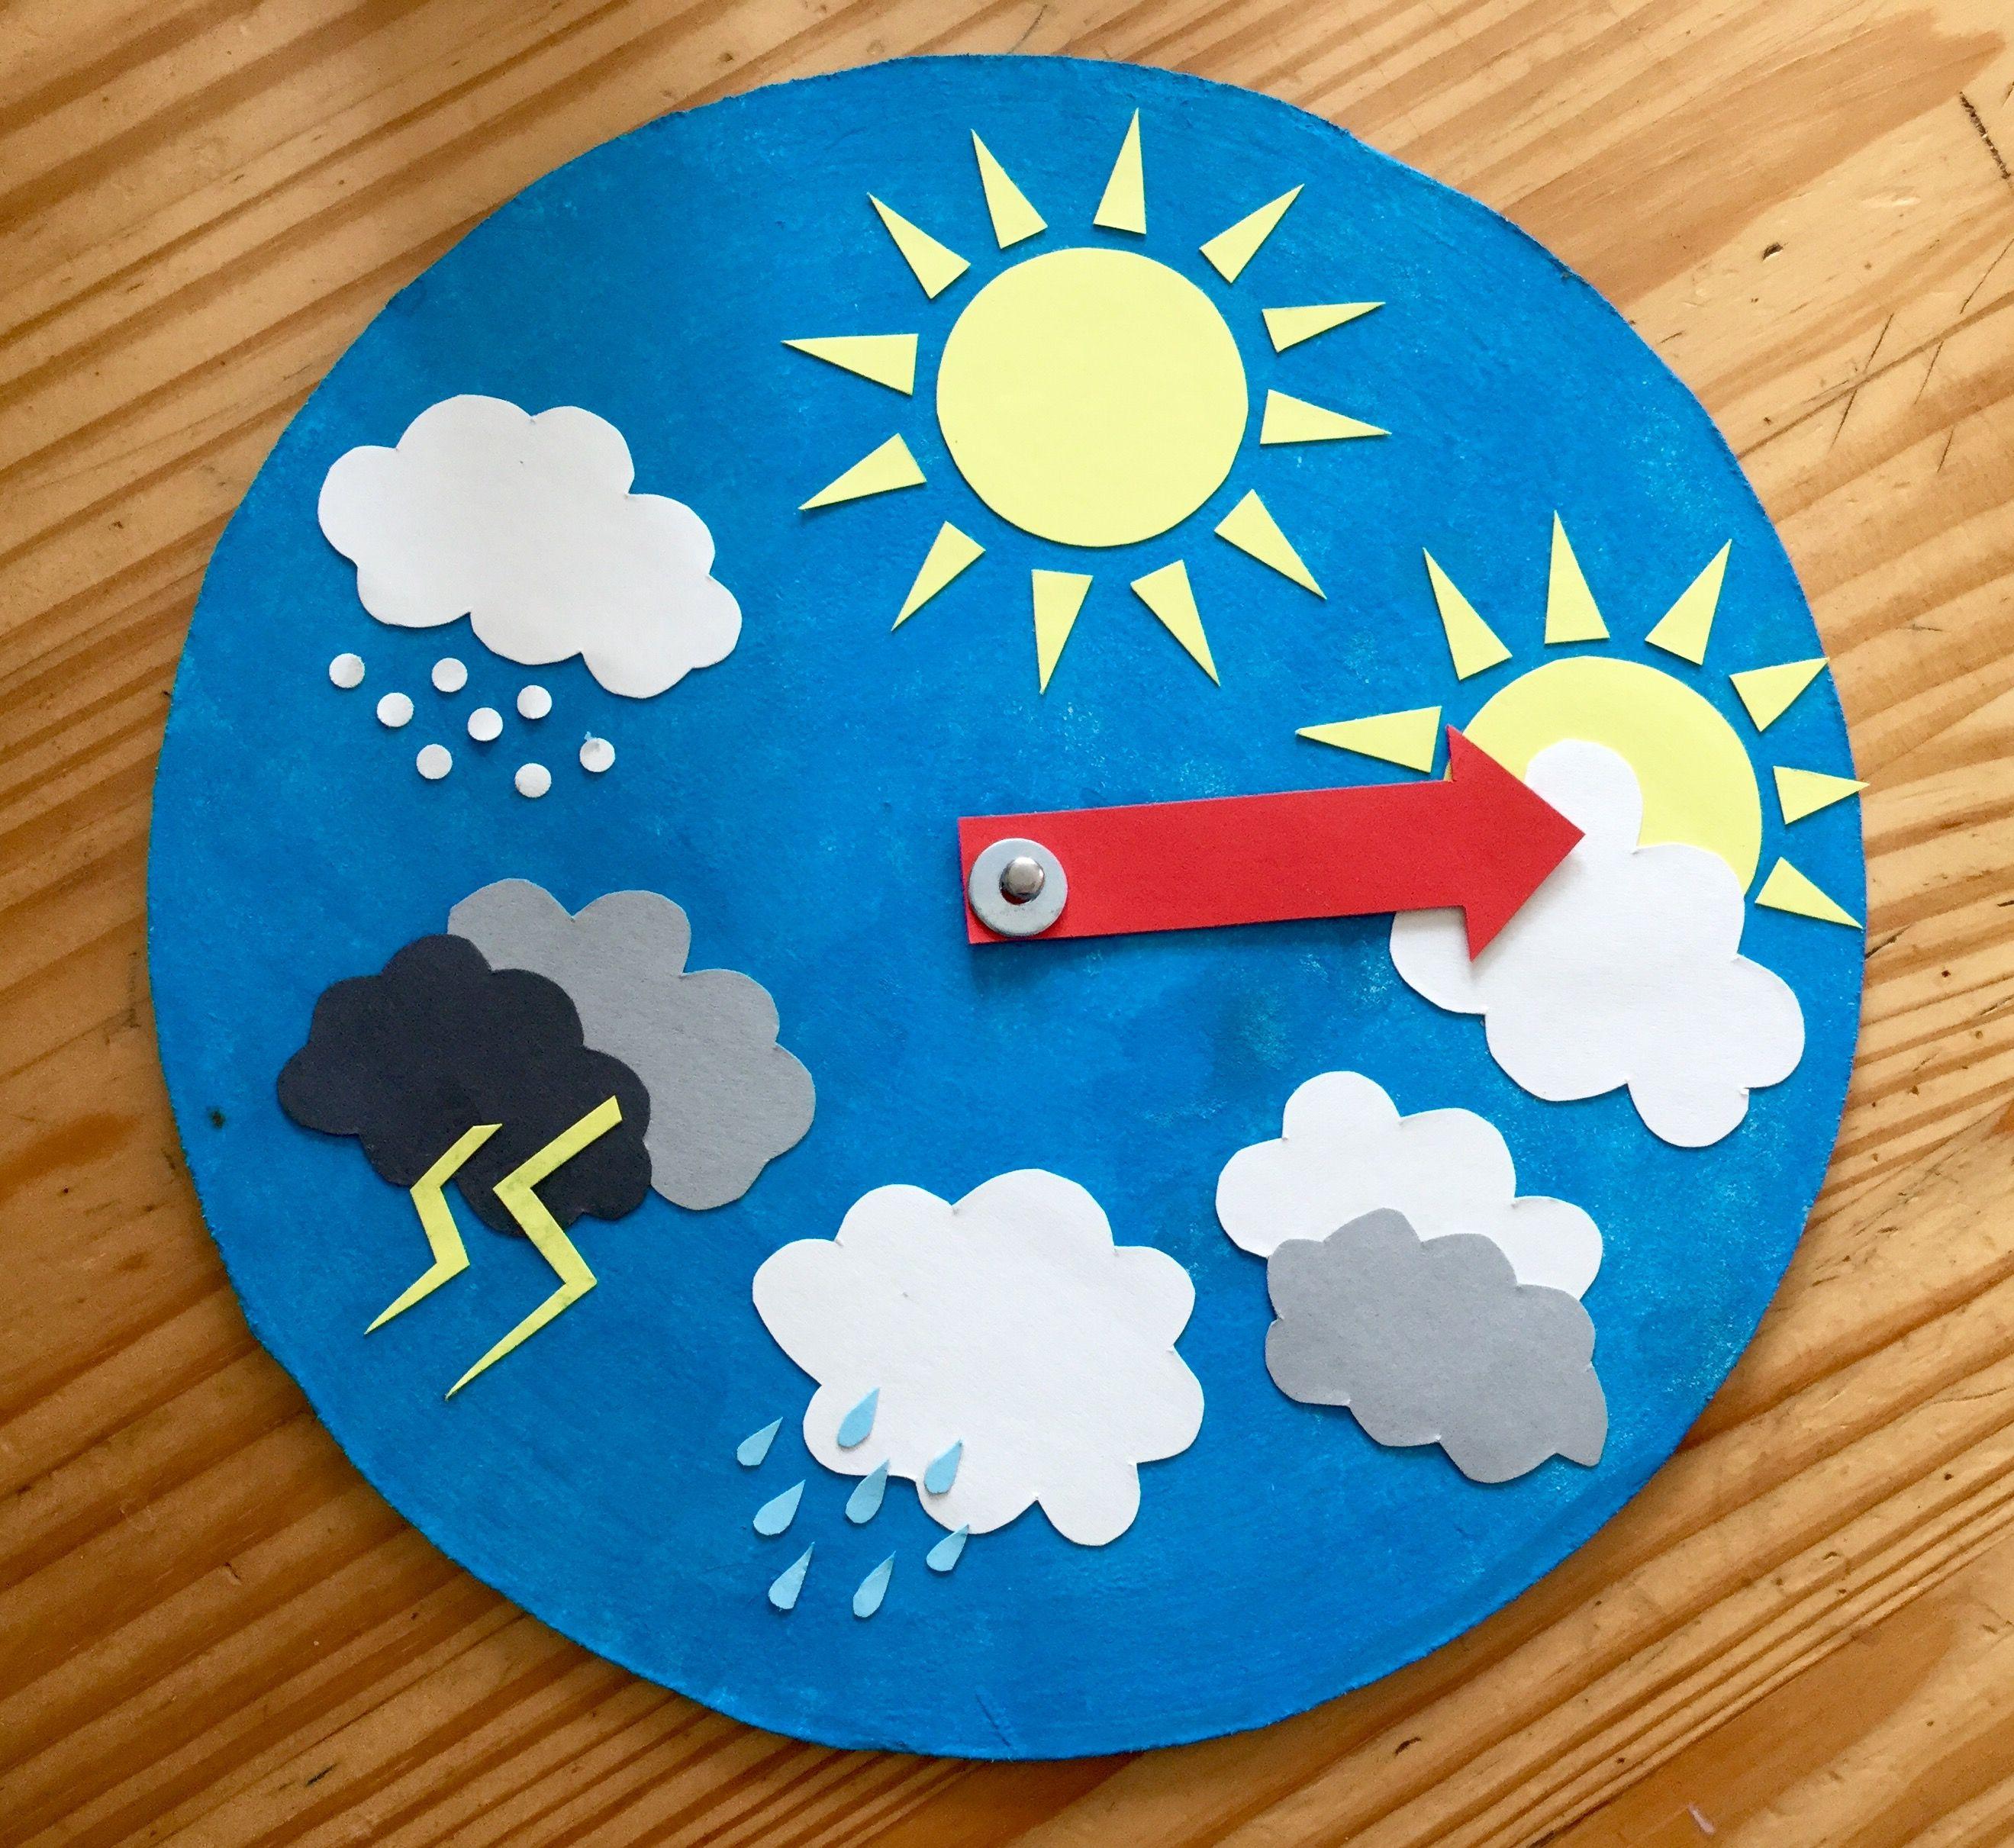 Wetterstation für Kinder | dolgu oyuncak | Pinterest | Kindergarten ...